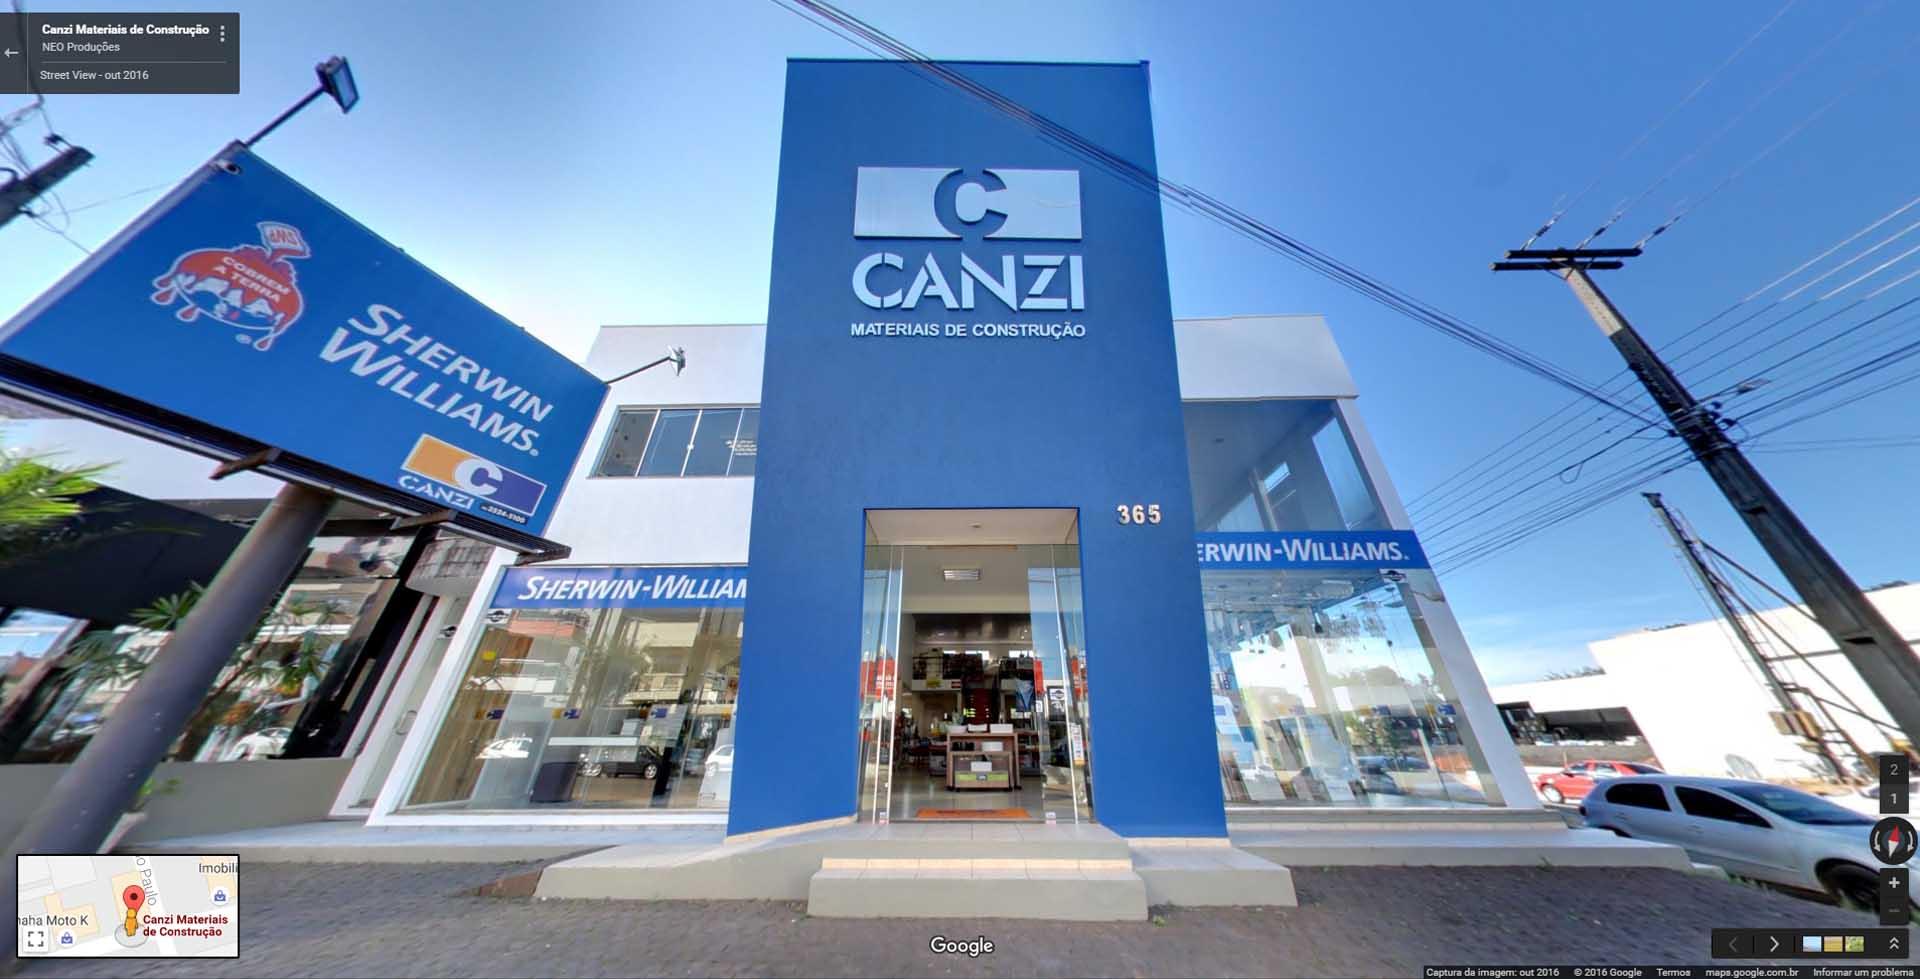 Canzi